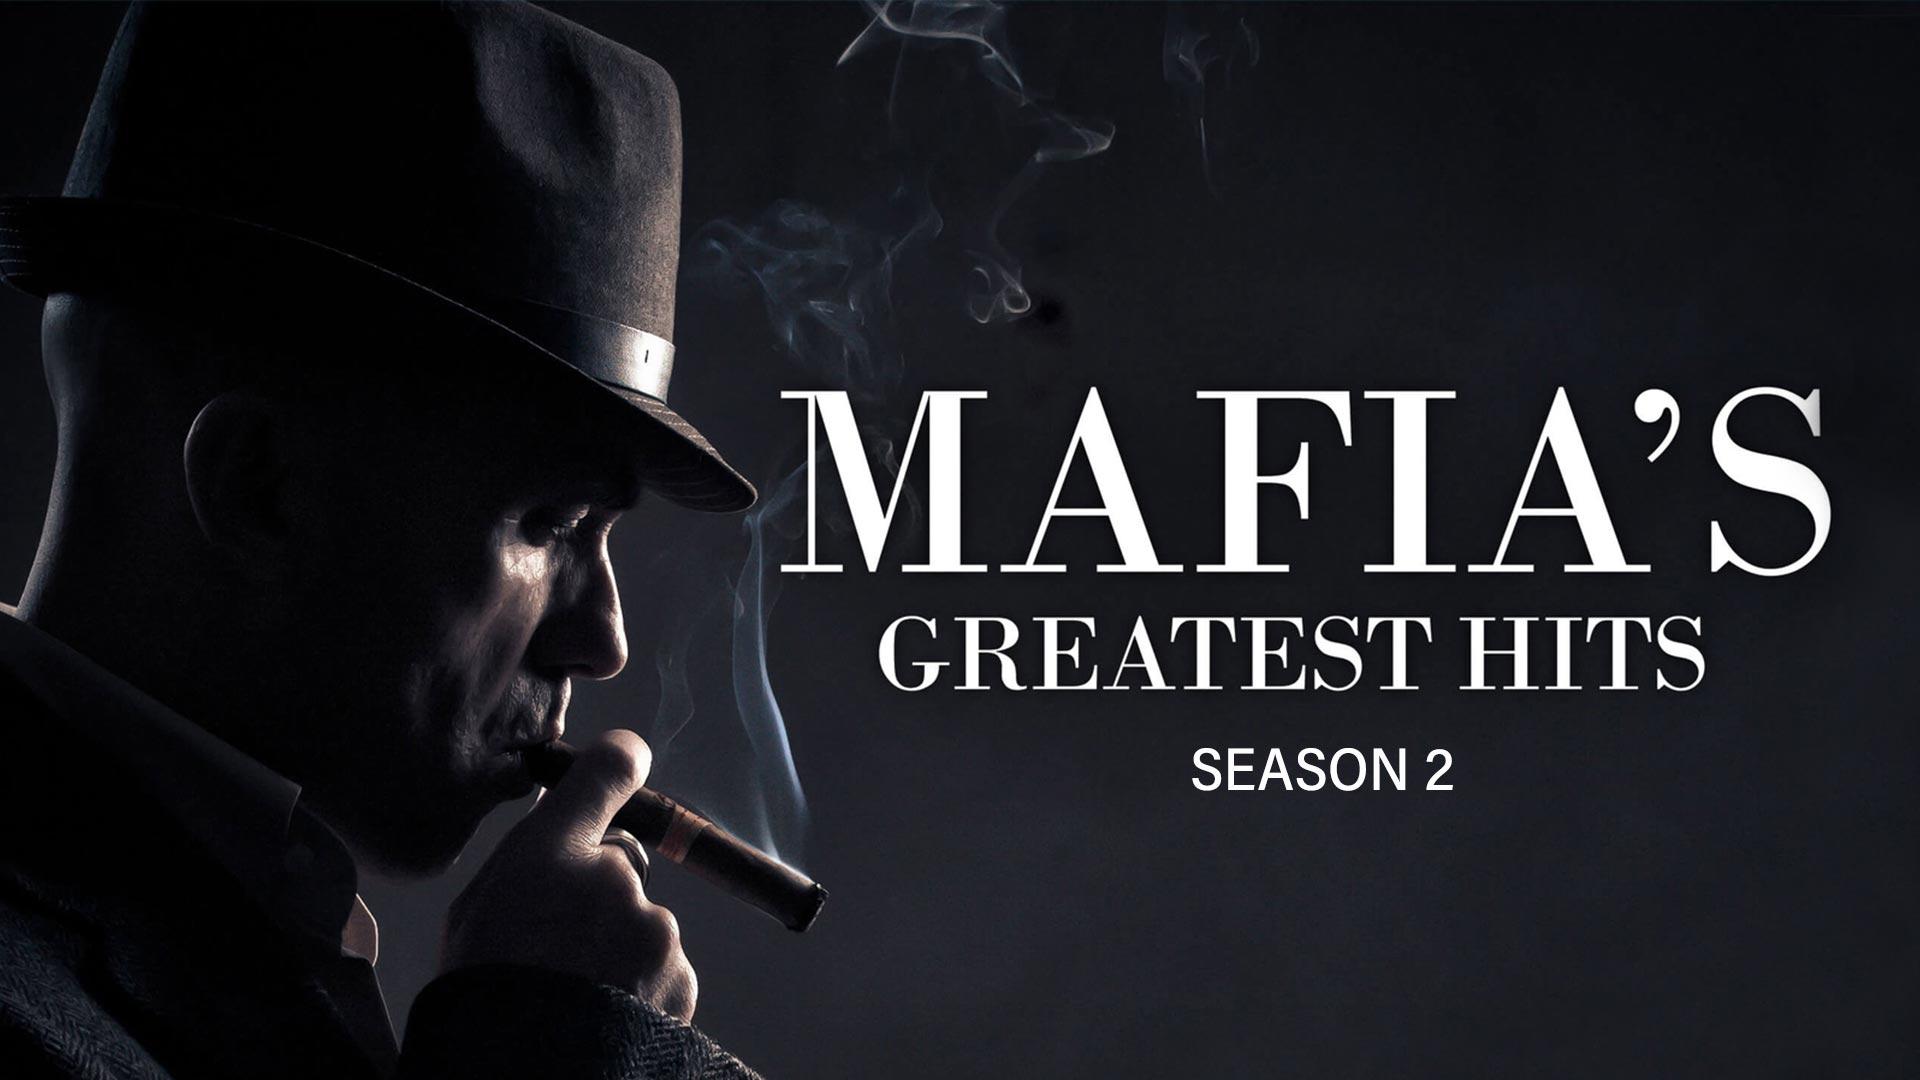 Mafia's Greatest Hits - Season 2